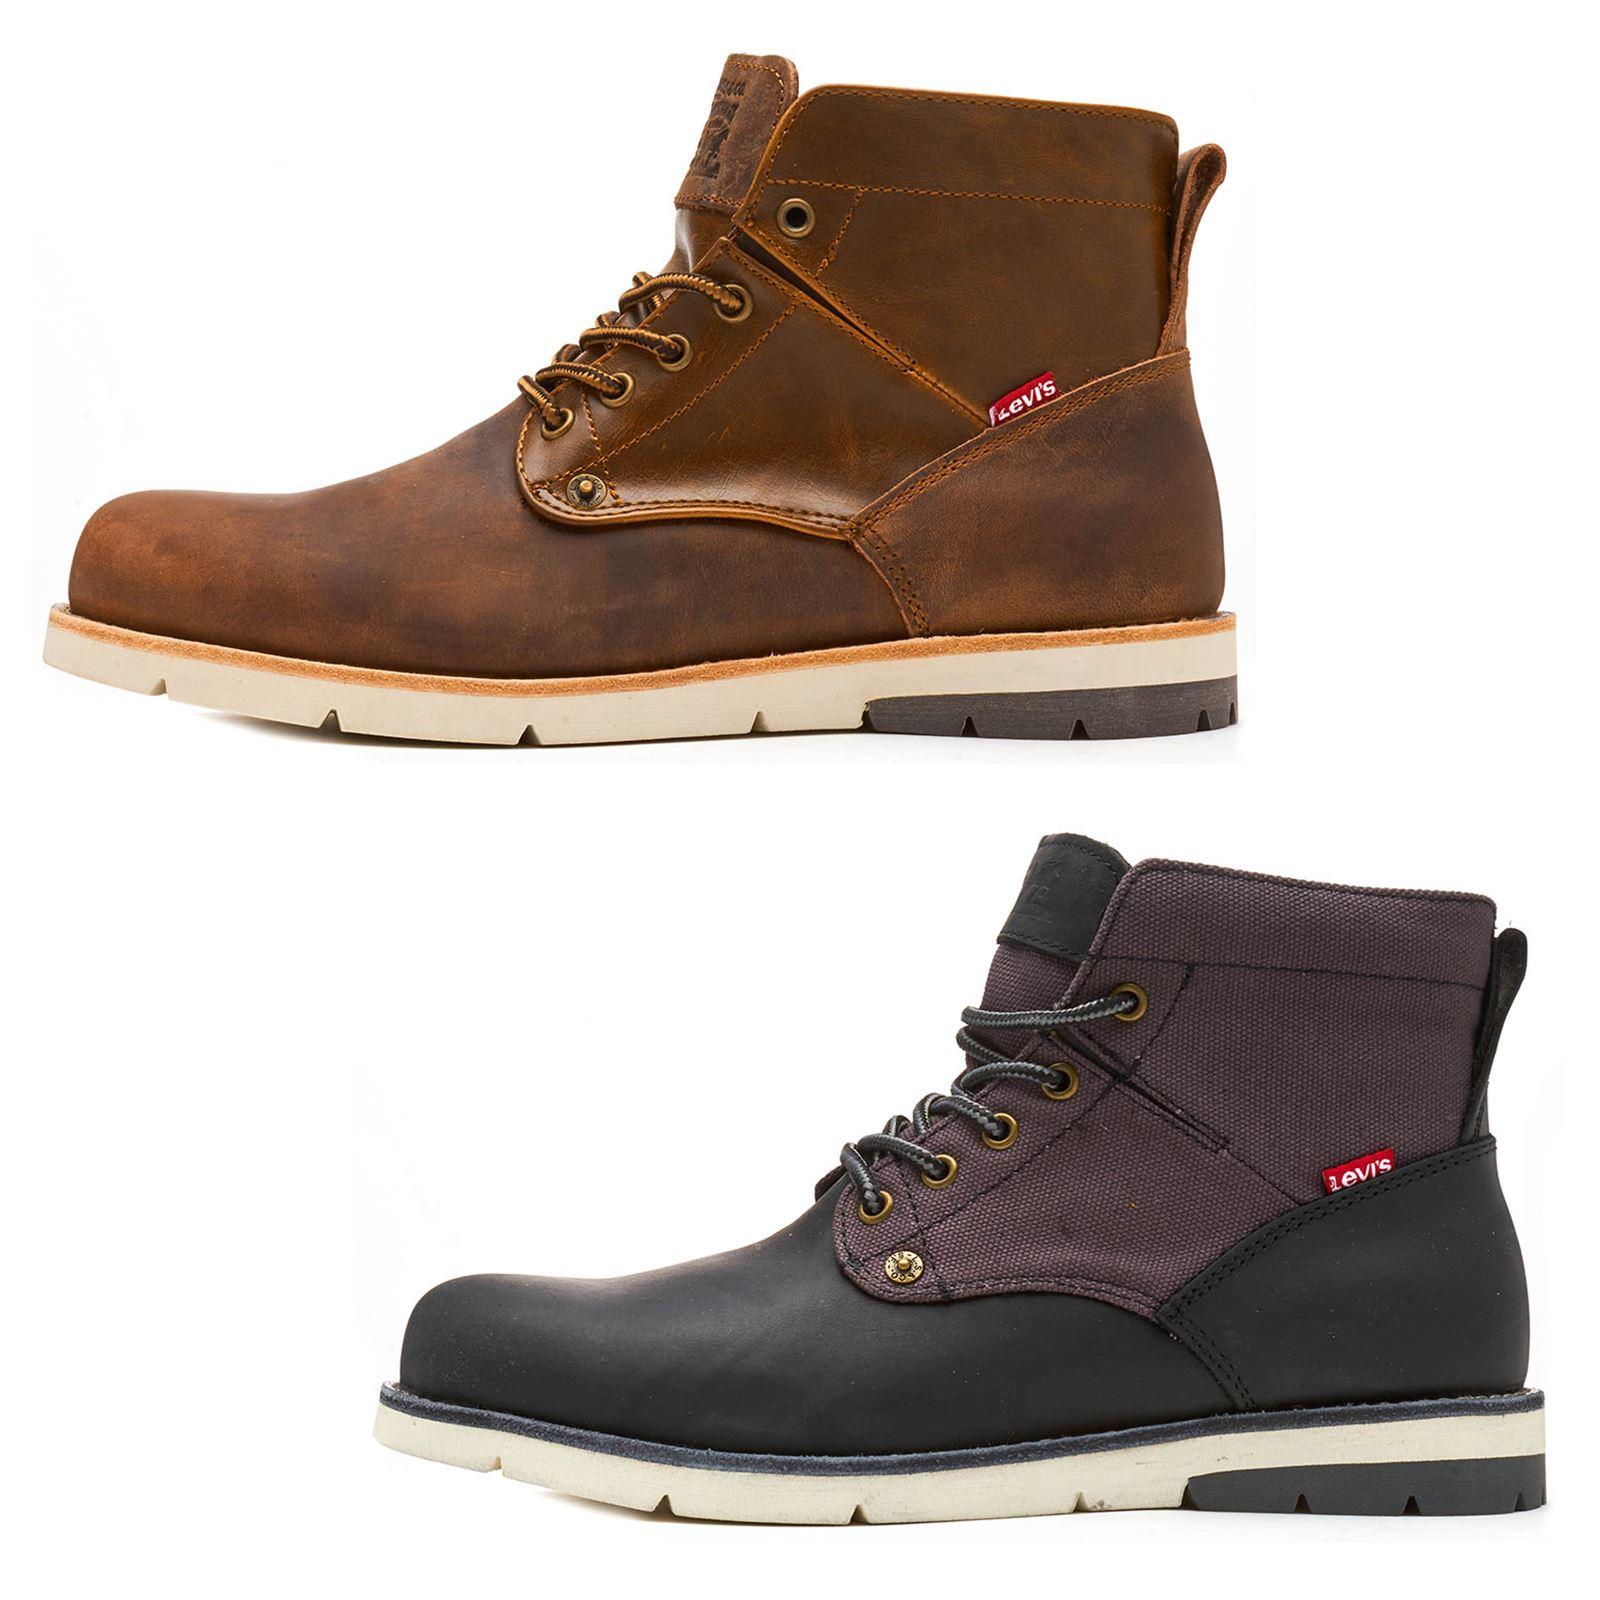 4c989369df4 In Leather Boots Ankle Jax Brown Regular Tab Dark Red Levis Black amp   5pZwYRqR